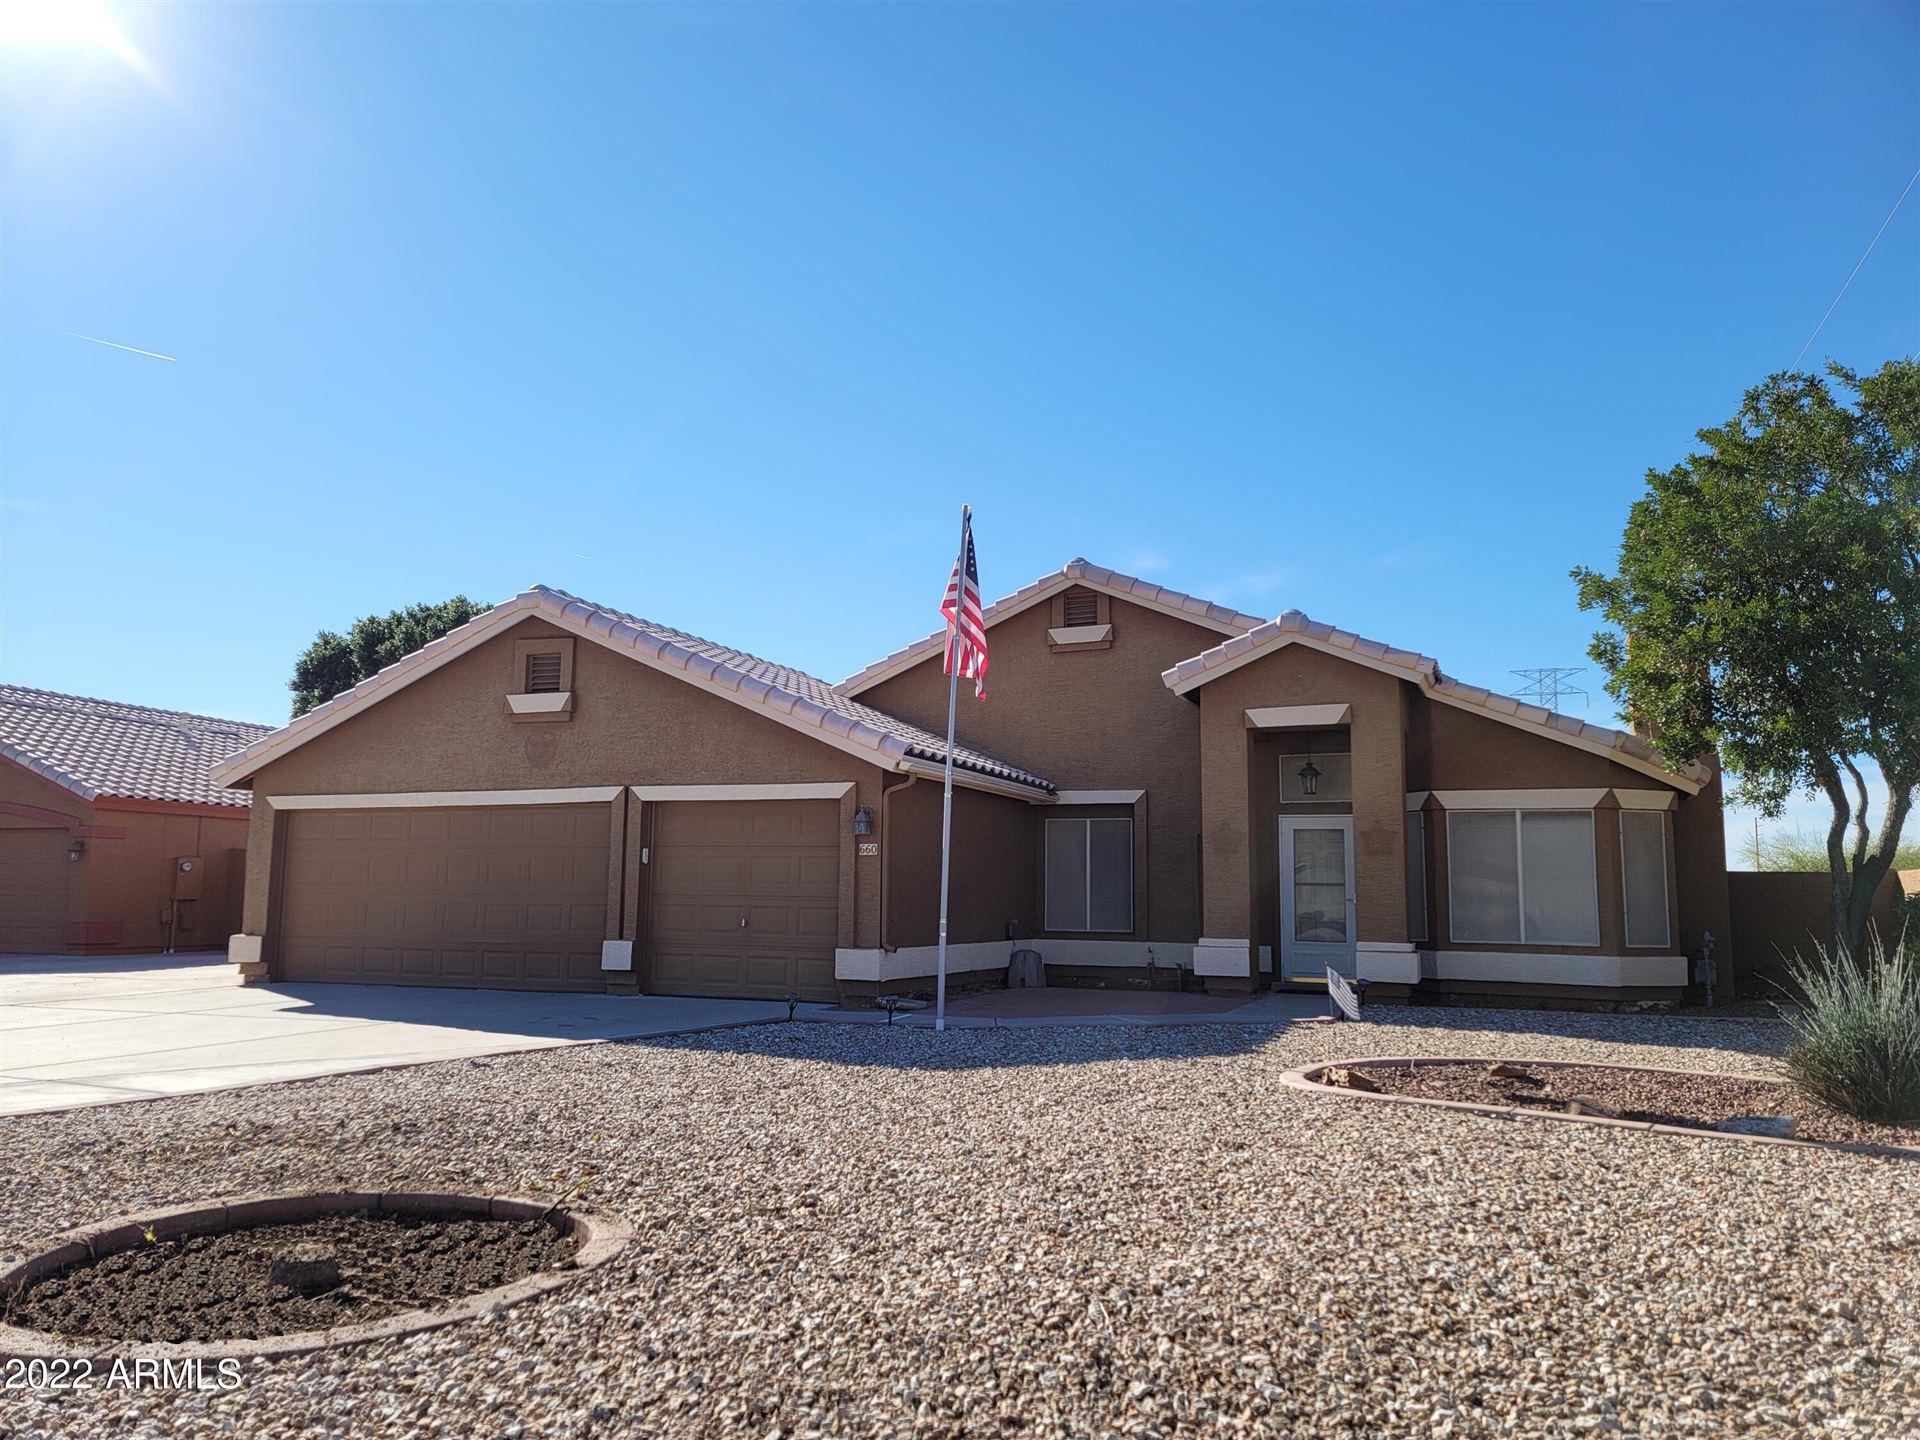 660 N PALO VERDE --, Mesa, AZ 85207 - MLS#: 6292708